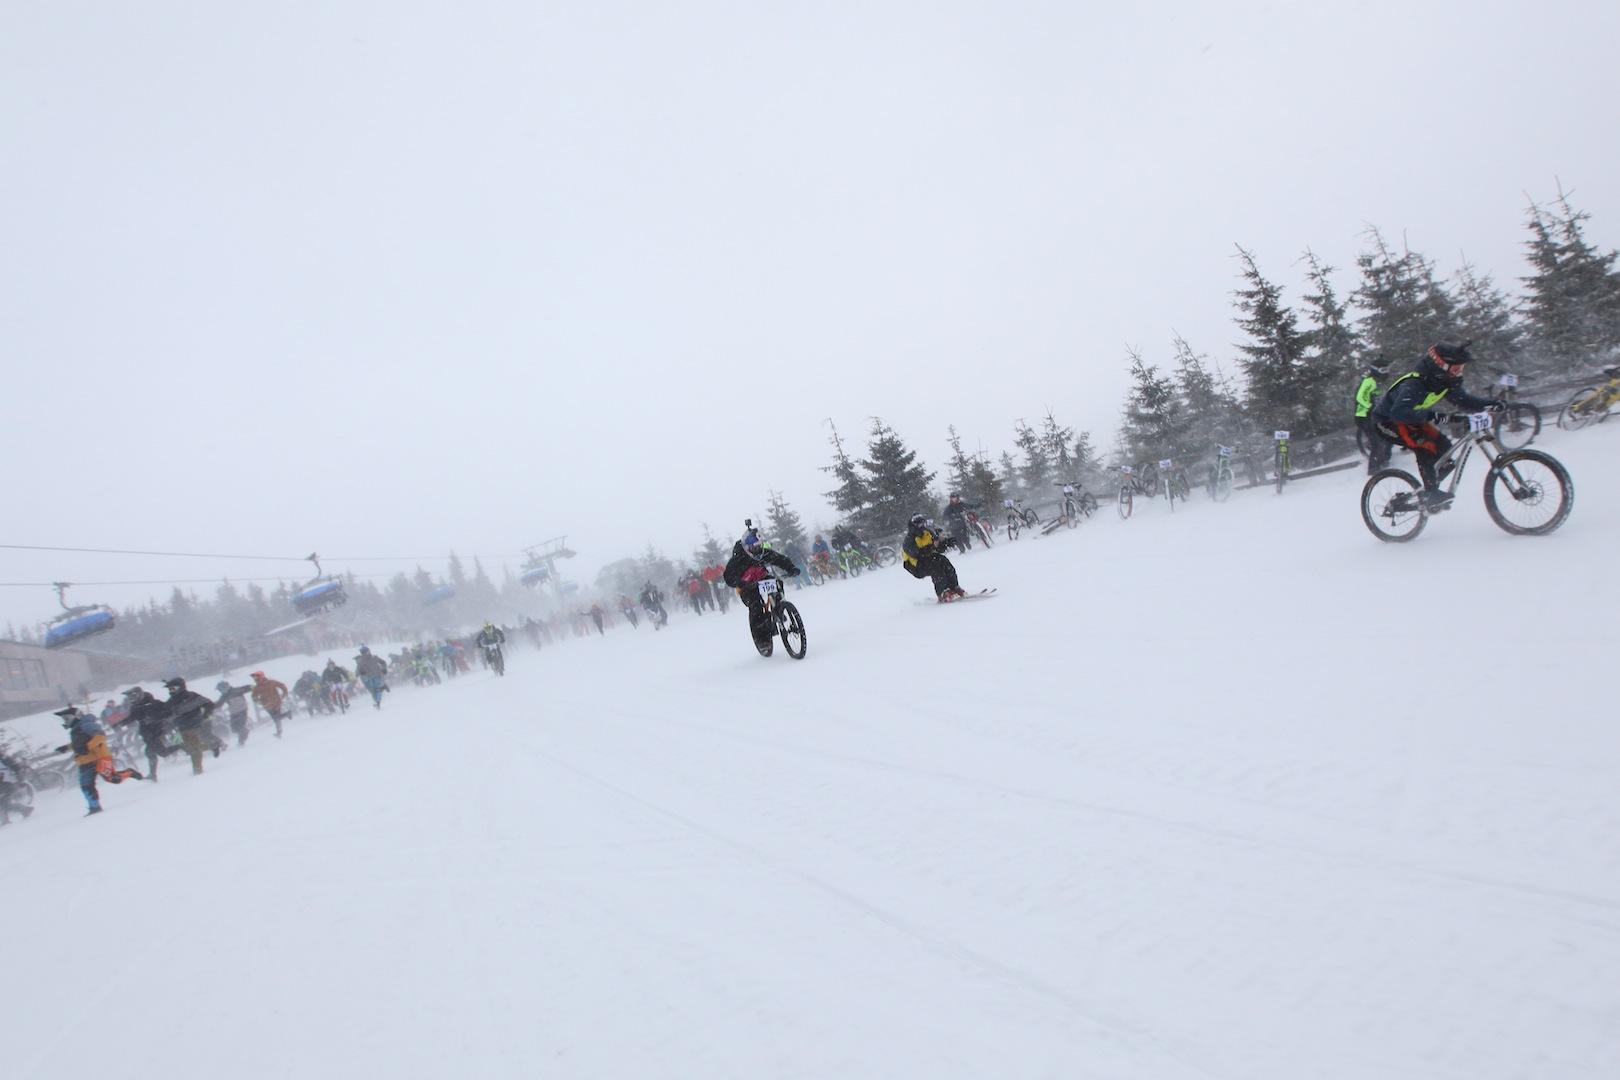 Čtvrtý ročník Chinese Downhill